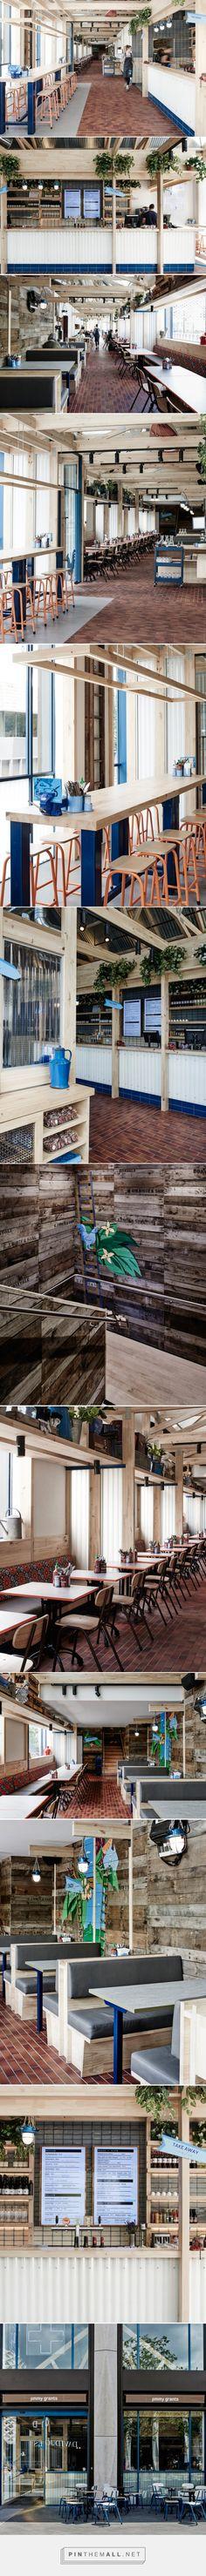 exposed timber frame highlights interior of techné's souvlaki restaurant - created via https://pinthemall.net